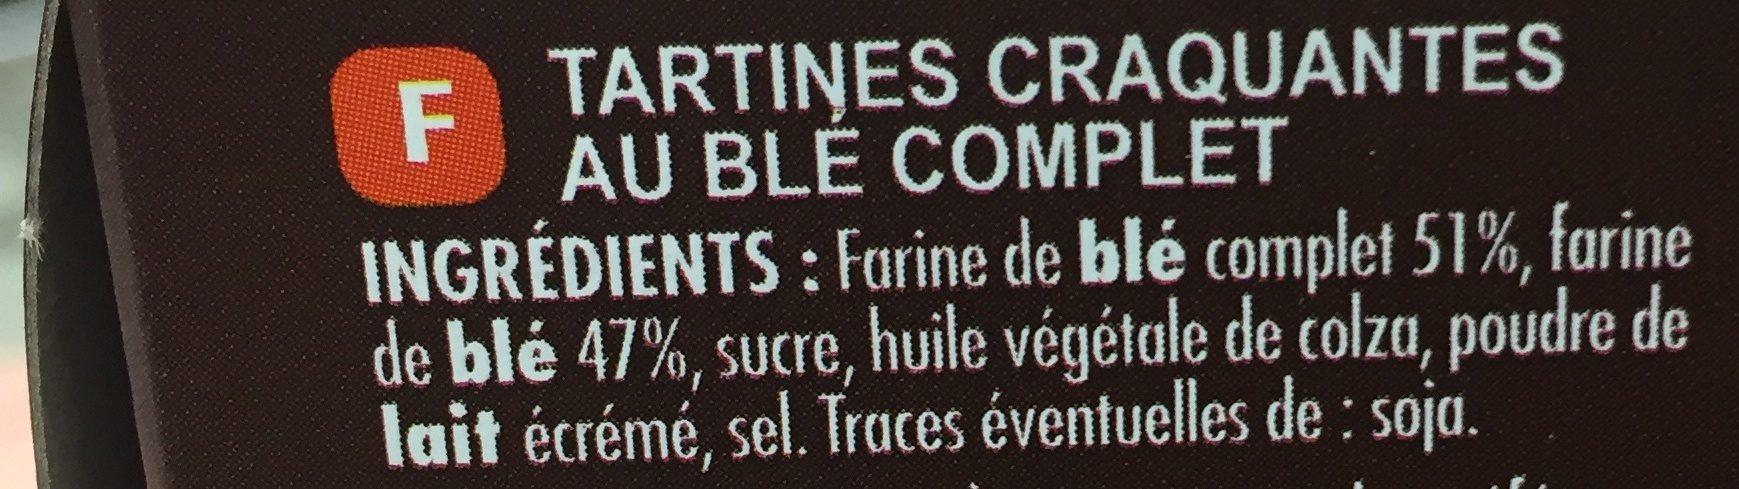 Tartines craquantes blé complet - Ingredienti - fr